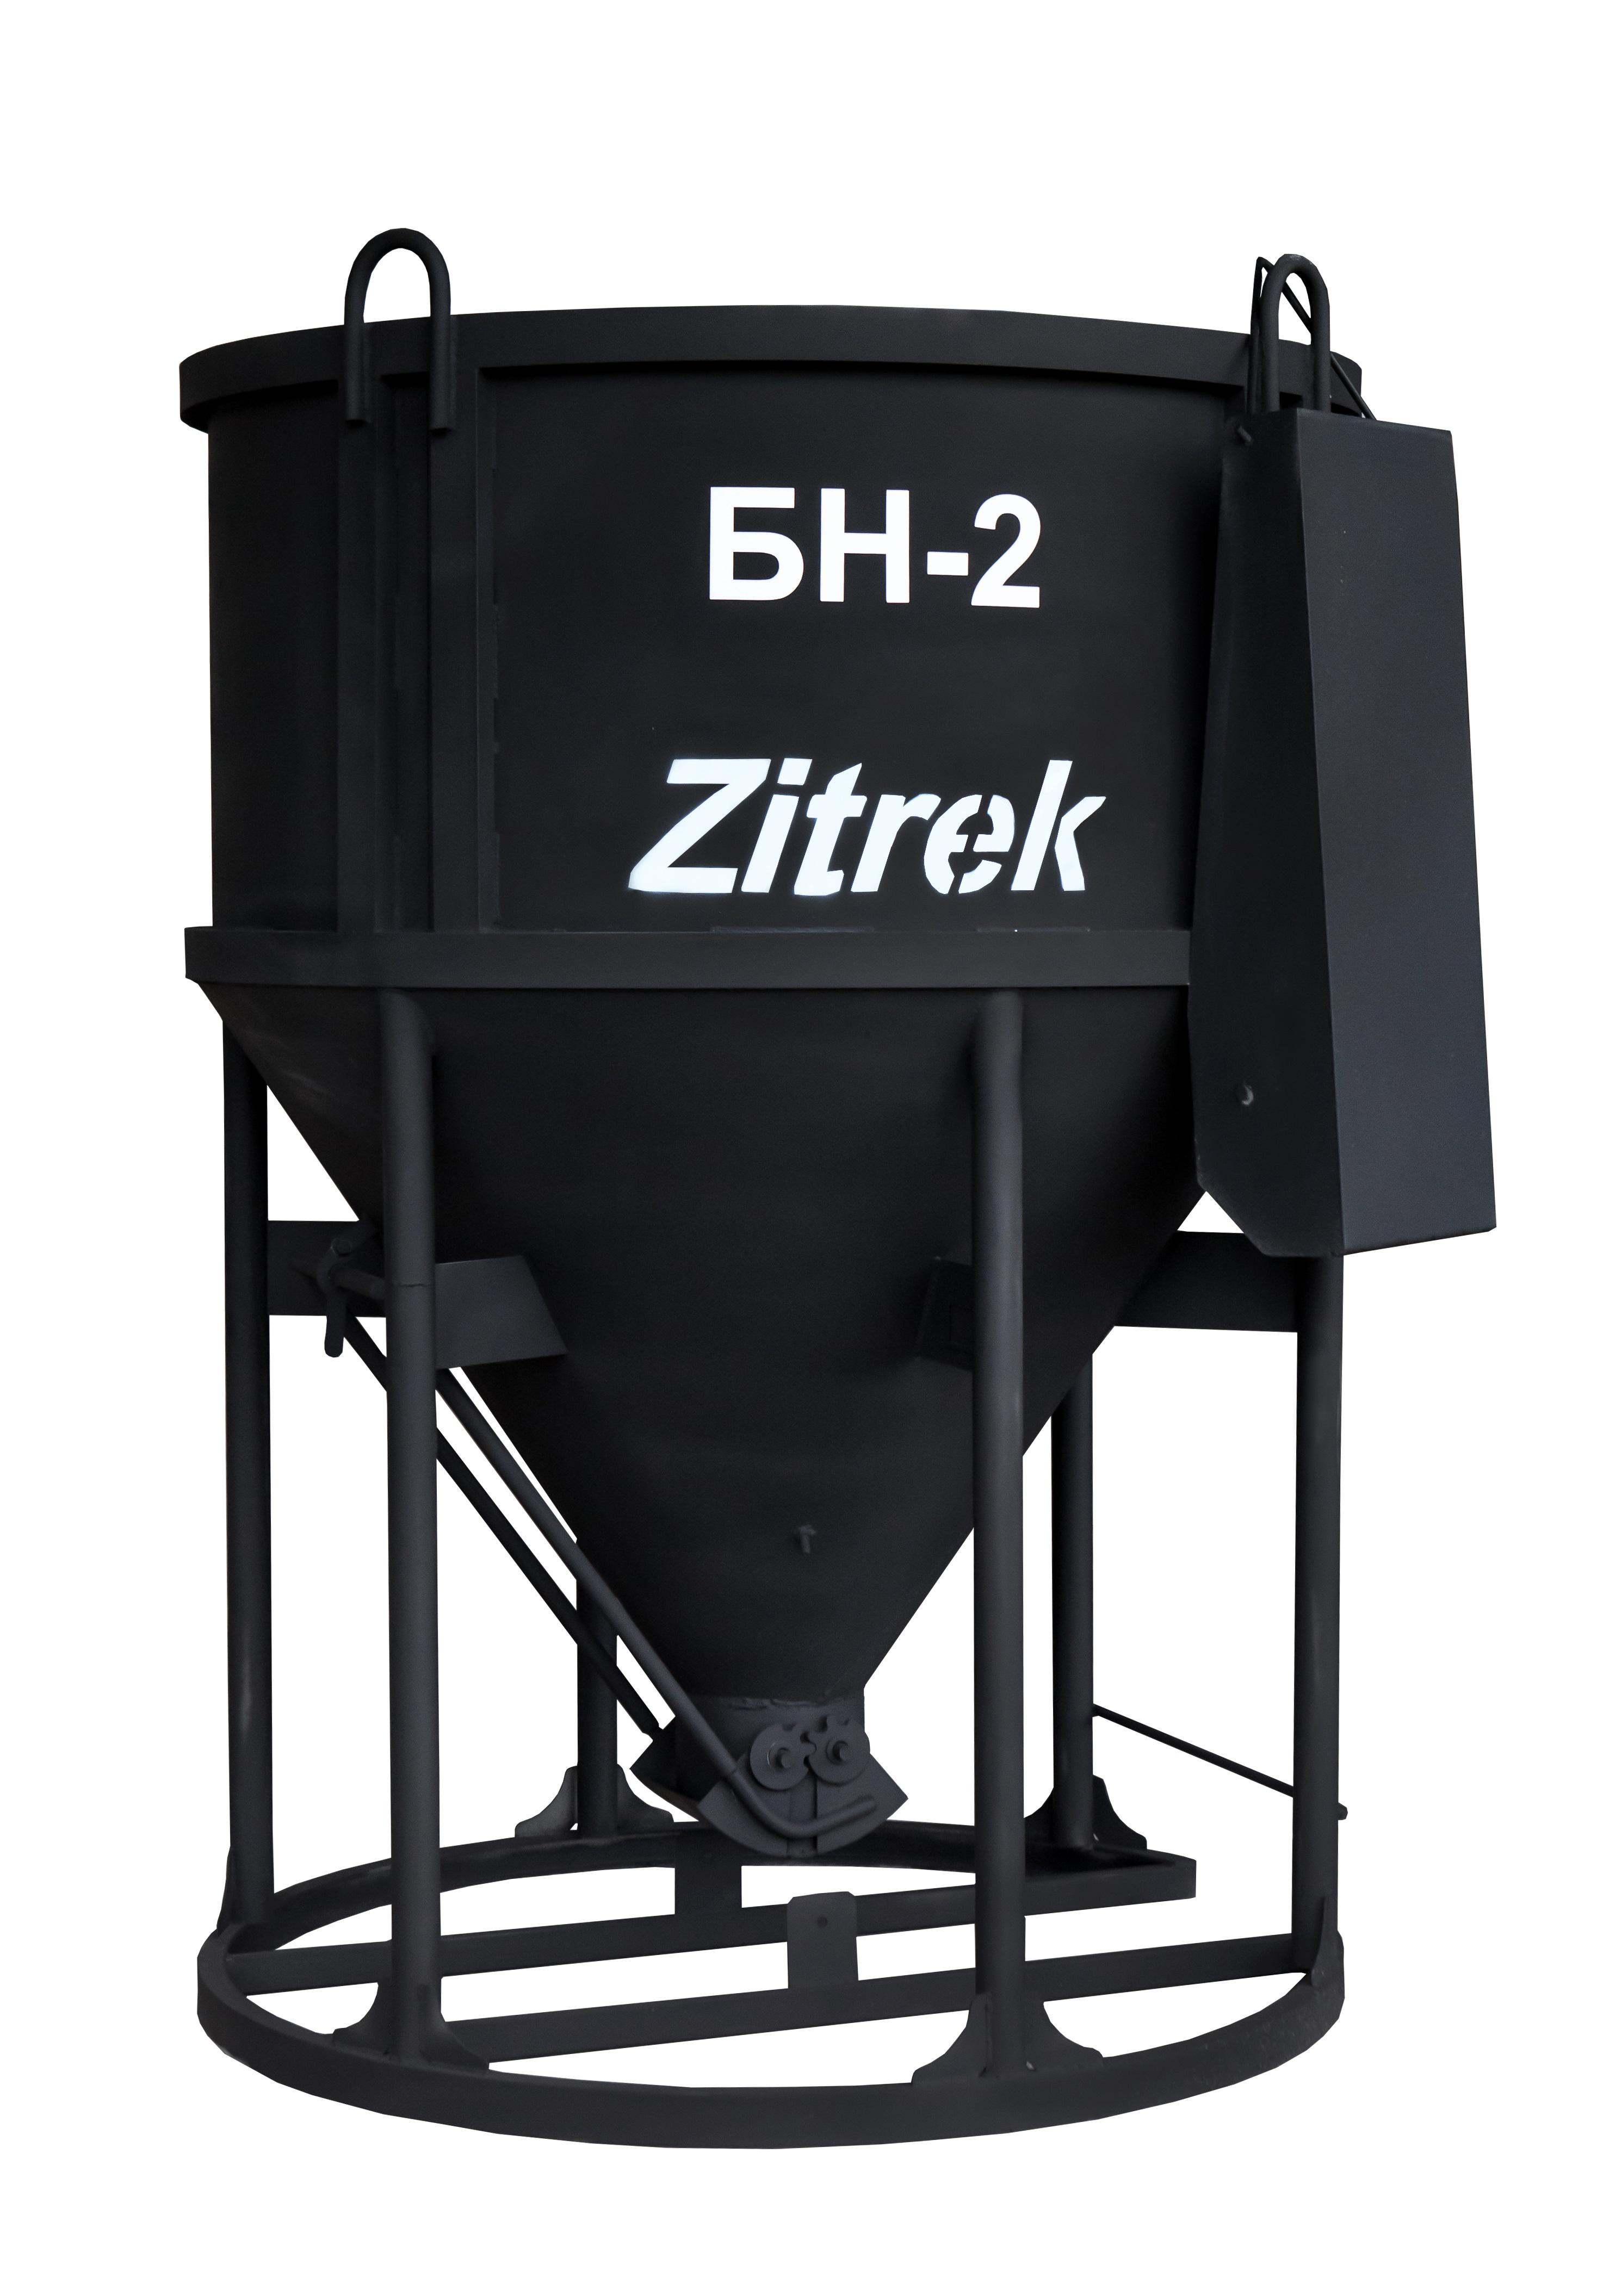 Бадья для бетона Zitrek БН-2.0 (021-1066) (лоток) цены